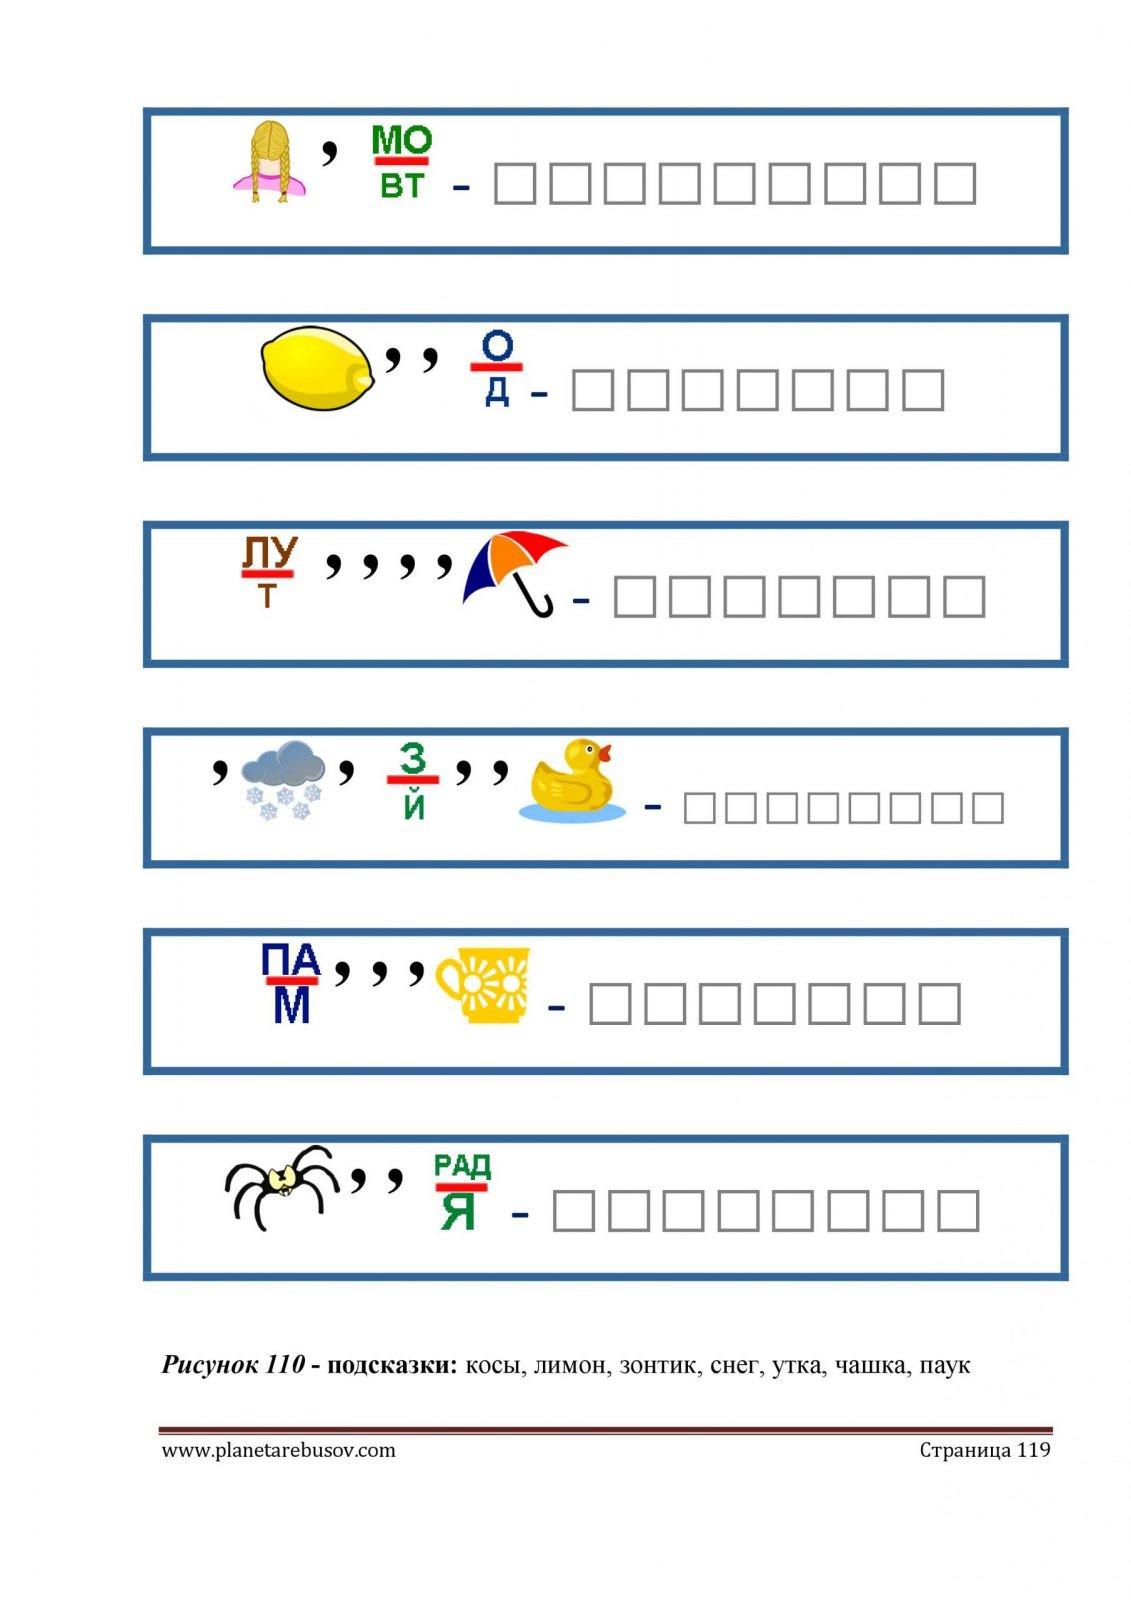 Ребусы-космонавт, лимонад, лунатик, незнайка, панамка, парадная